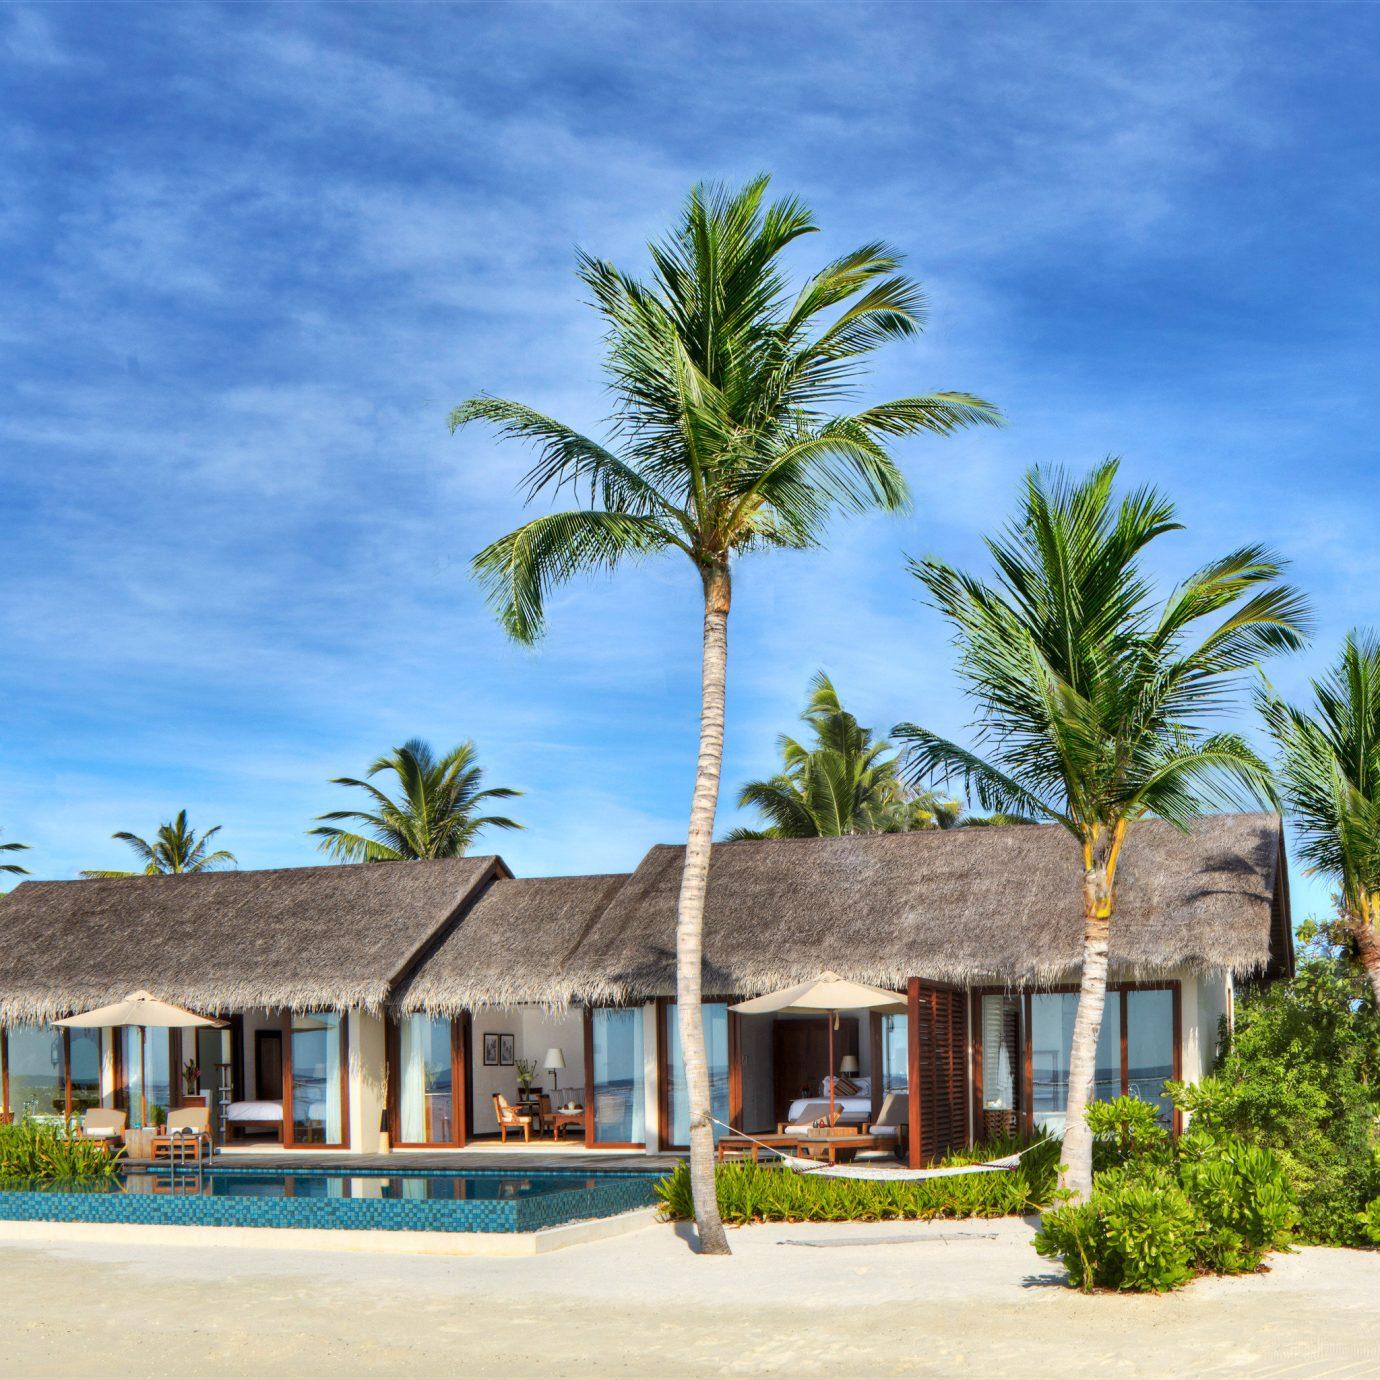 Beachfront Elegant Exterior Luxury Modern Romantic Villa tree sky house Beach Resort caribbean home arecales palm palm family Ocean Sea tropics Coast Village residential